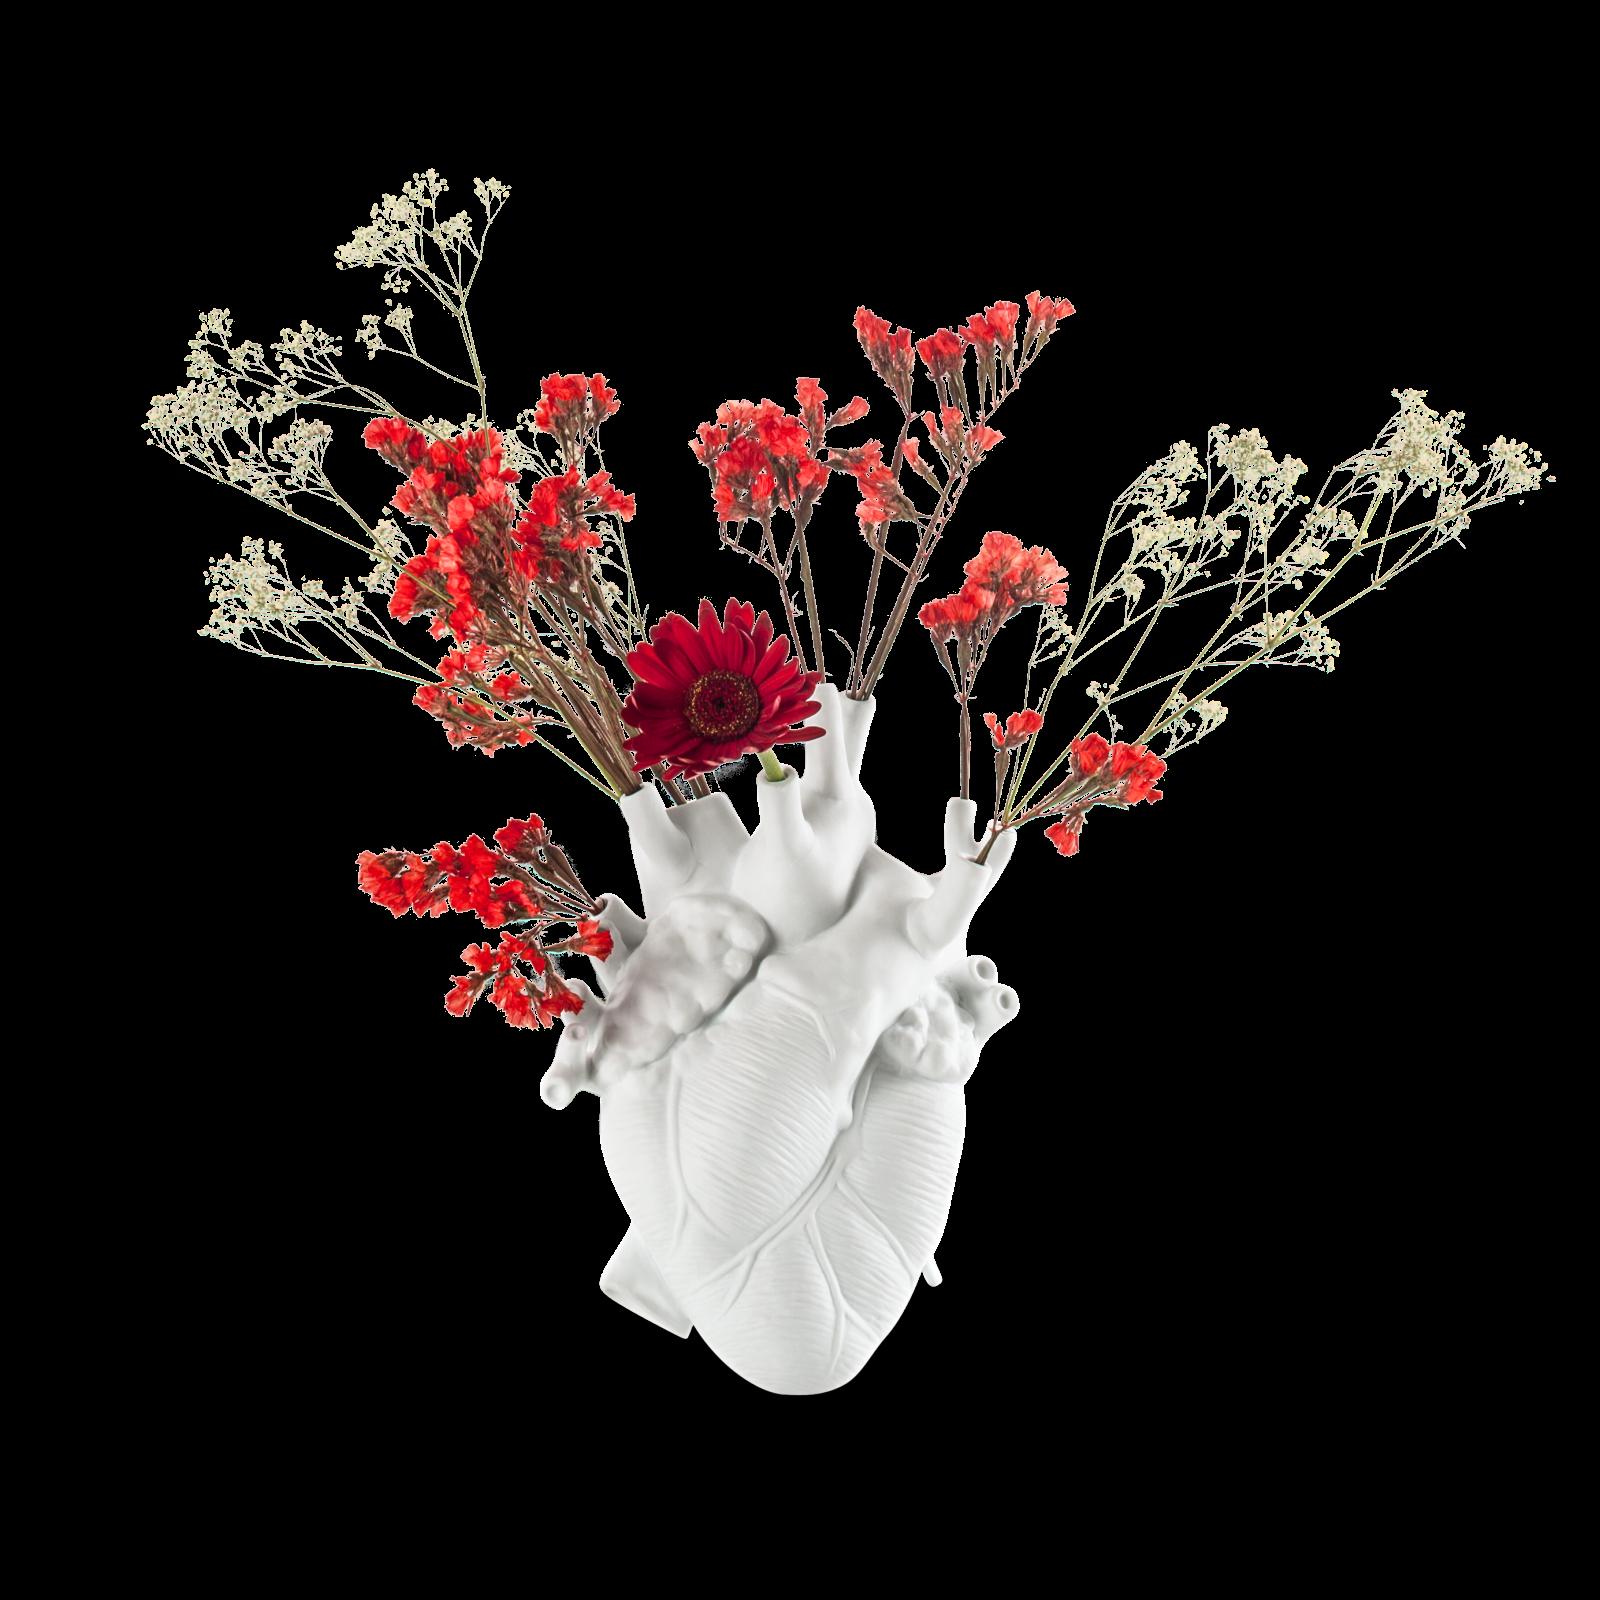 love-bloom-heart-shaped-vase-seletti-1